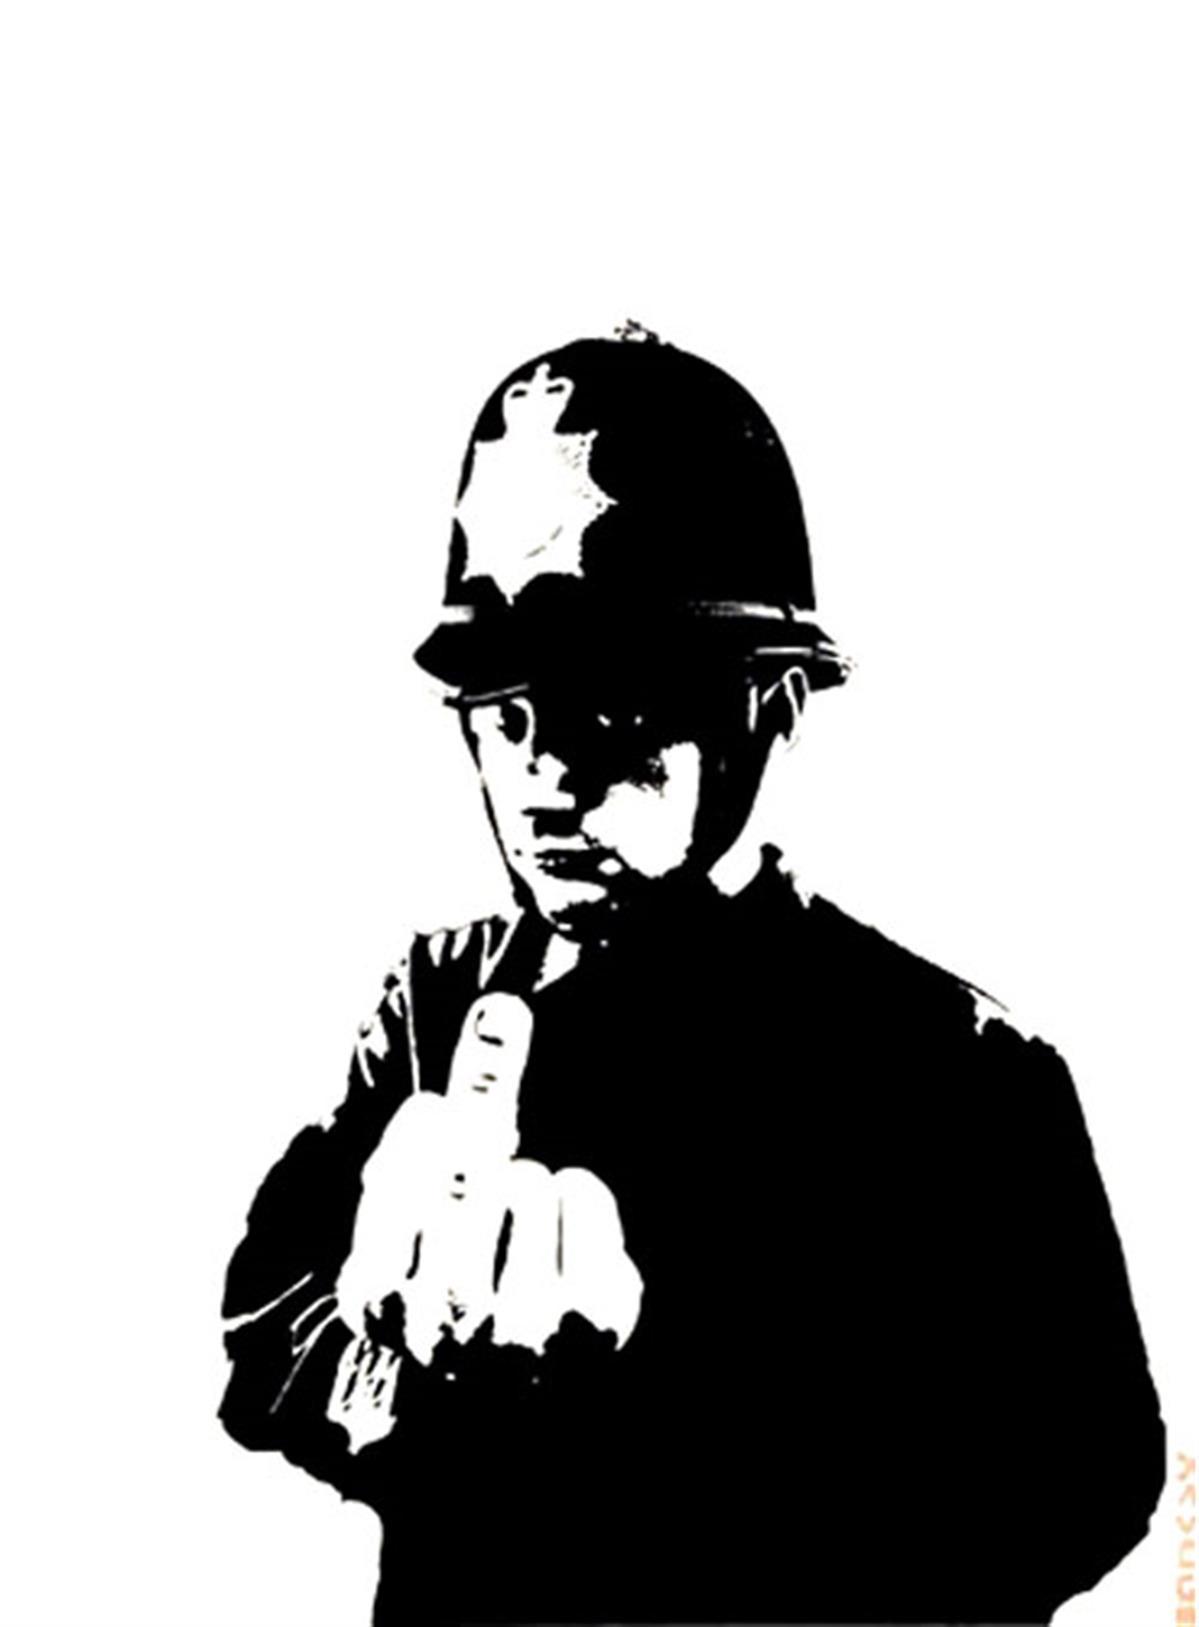 Rude Copper by Banksy